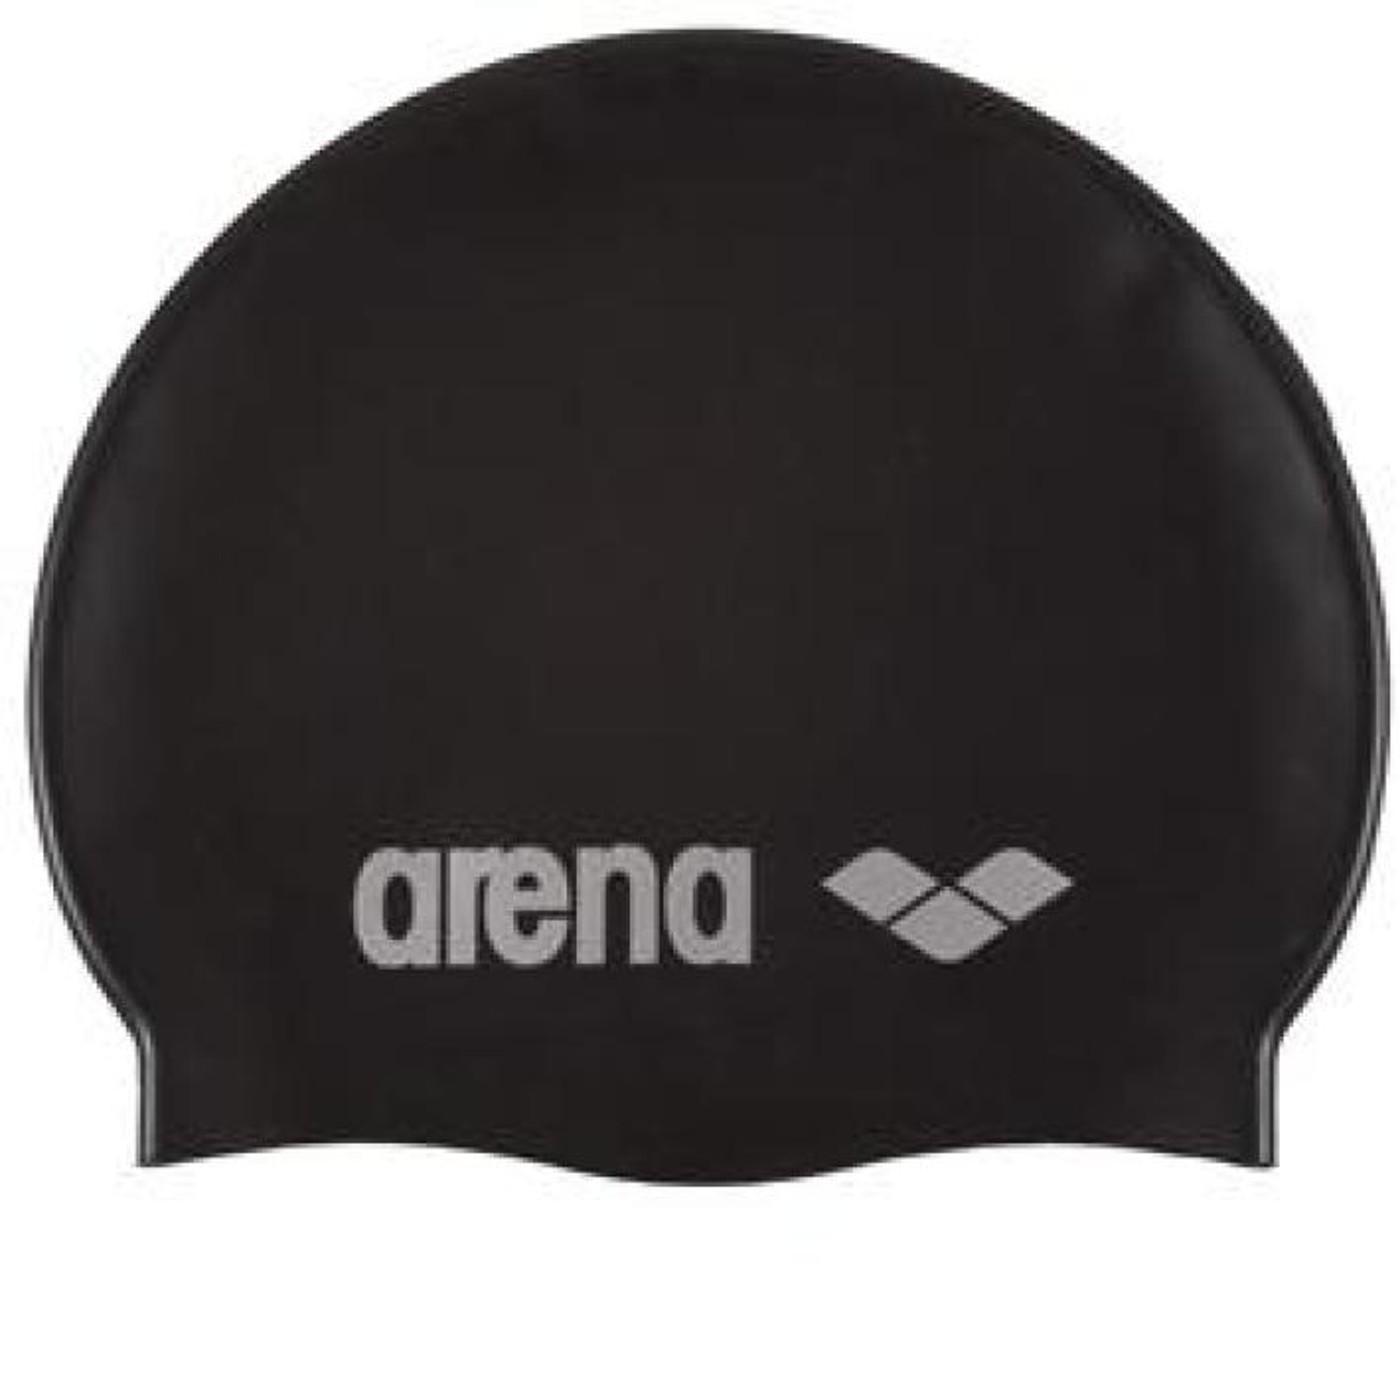 ARENA classic silicone